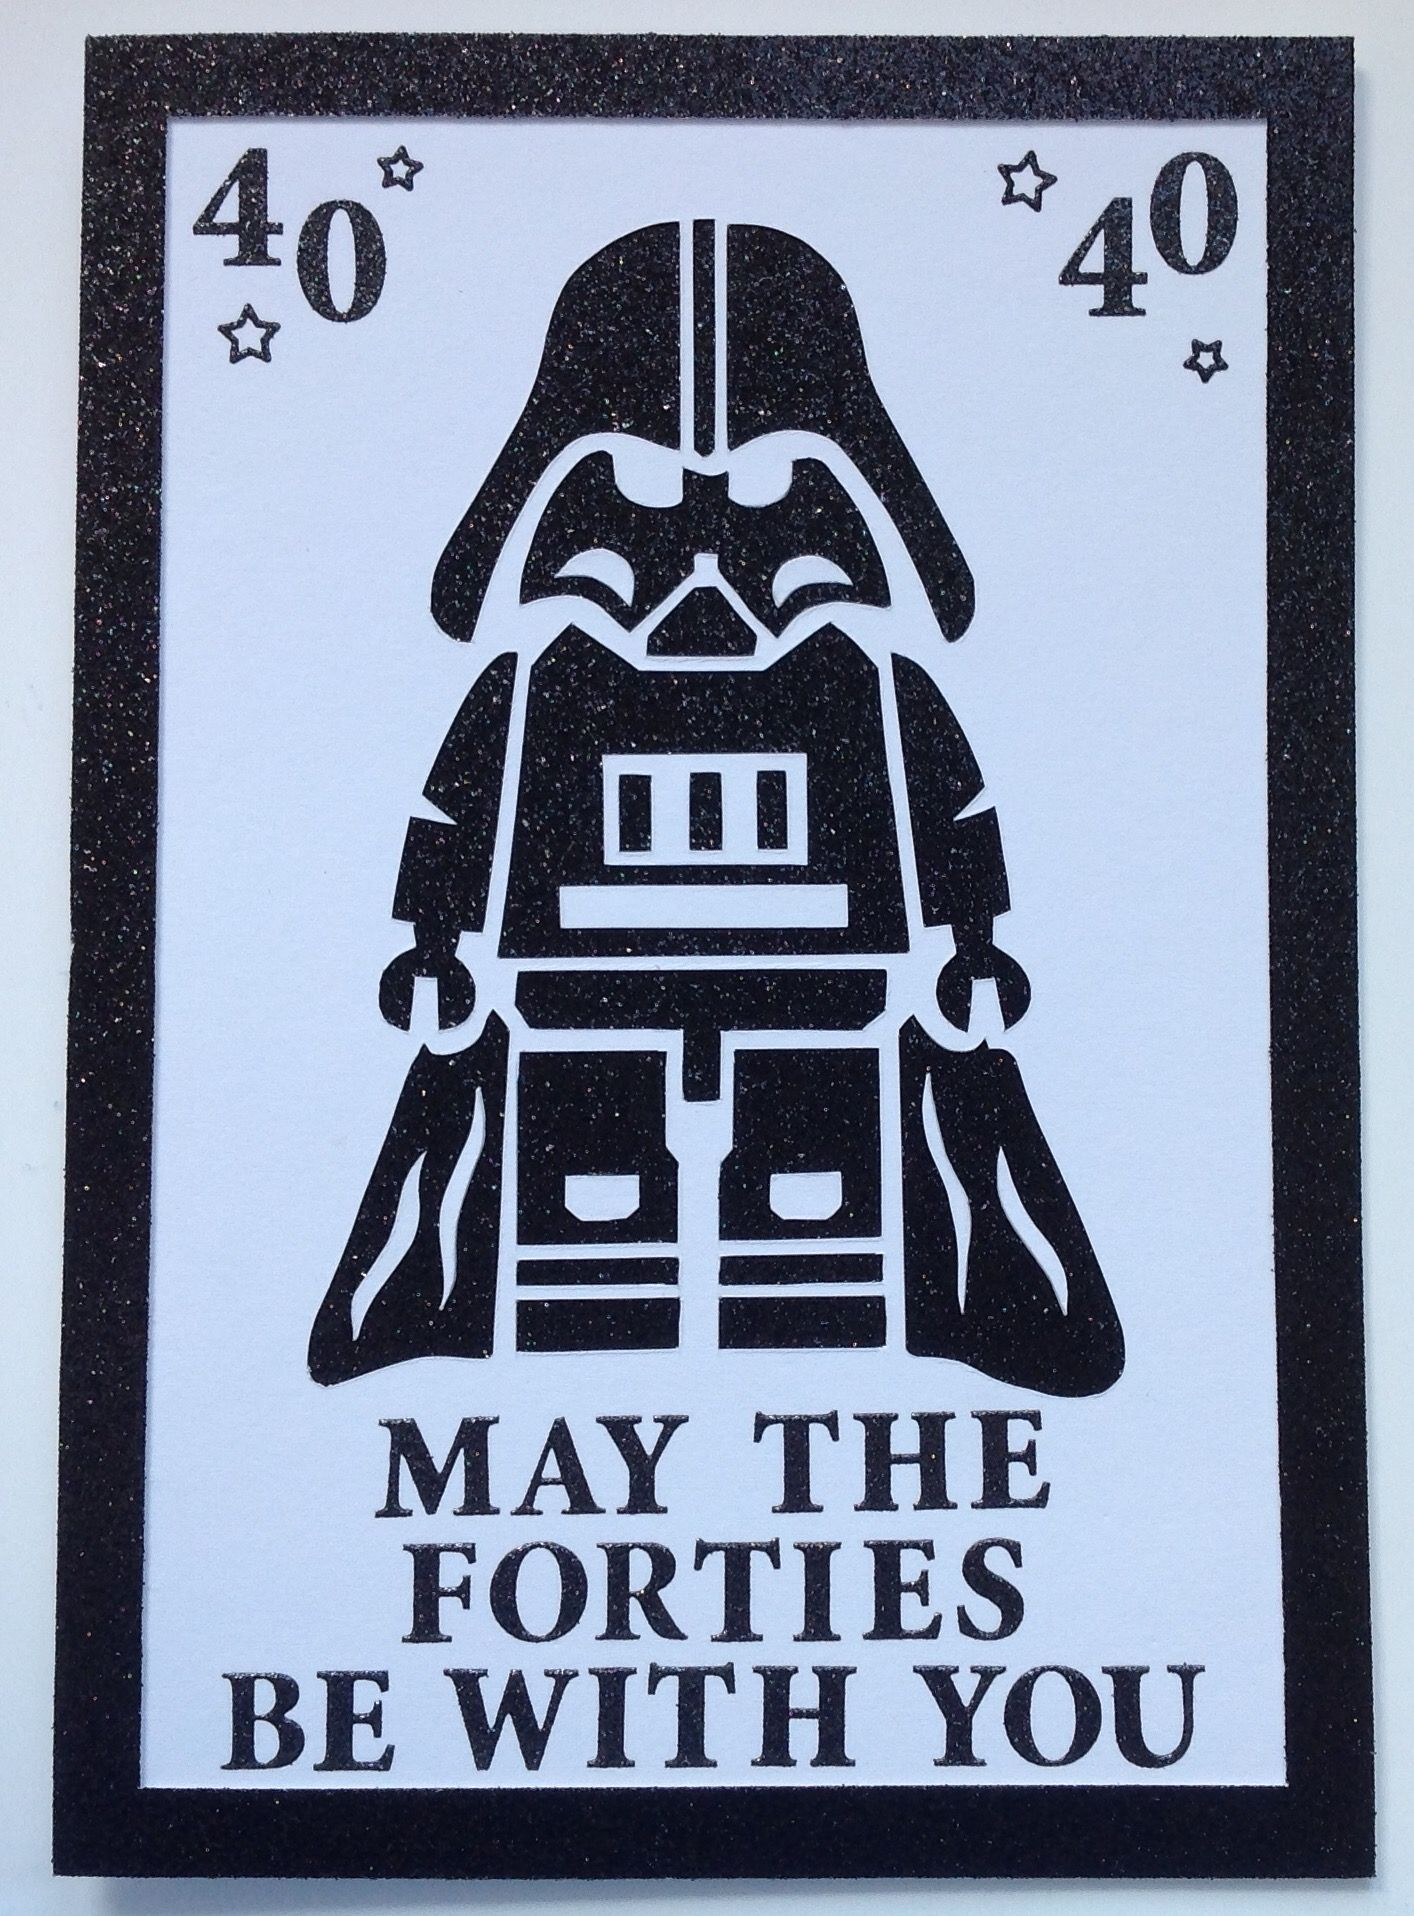 Star Wars 40th Birthday Card Birthday Cards For Friends 40th Birthday Funny 40th Birthday Cards